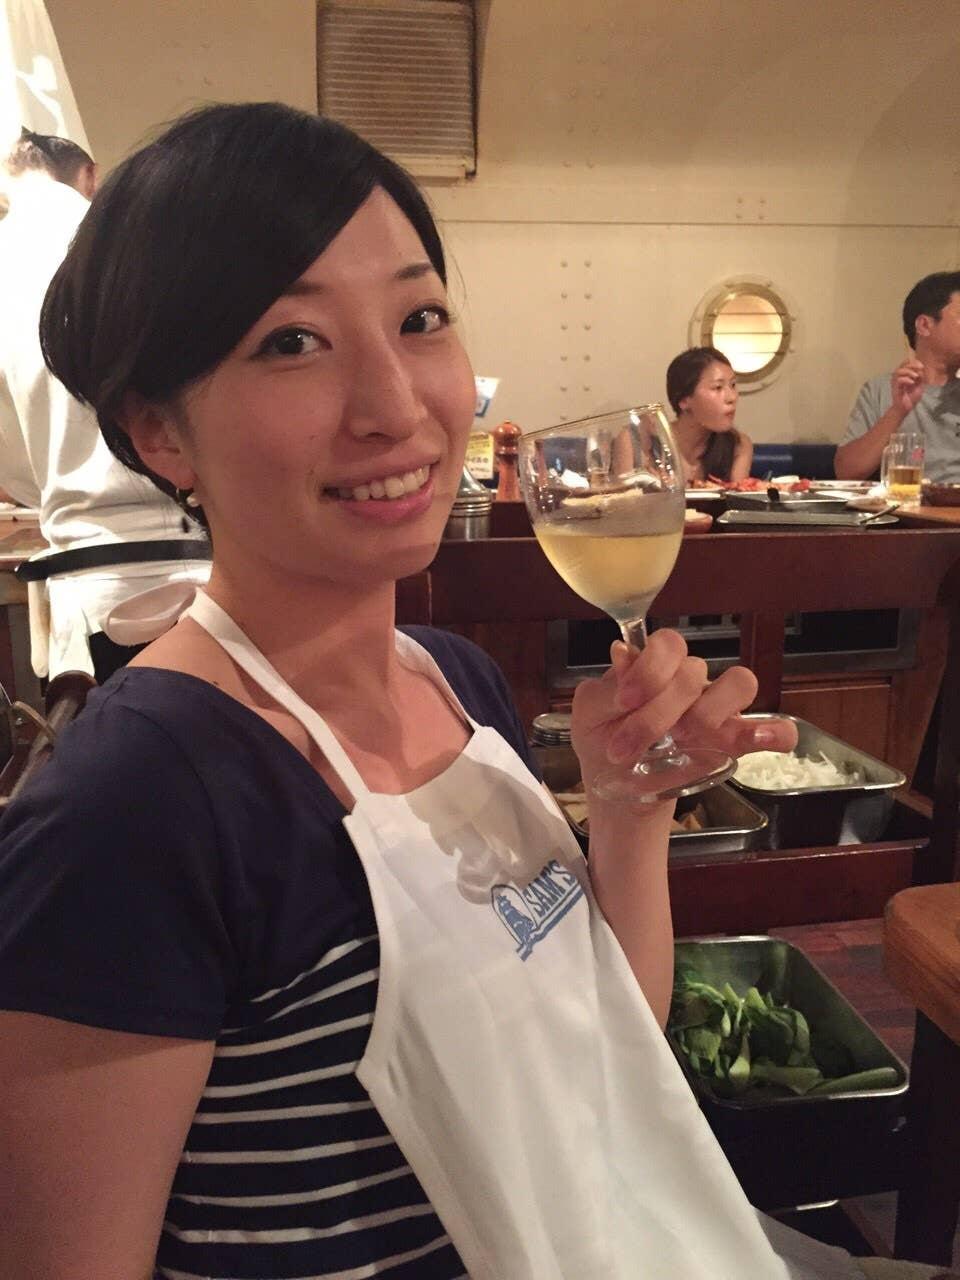 Tomomi Okano